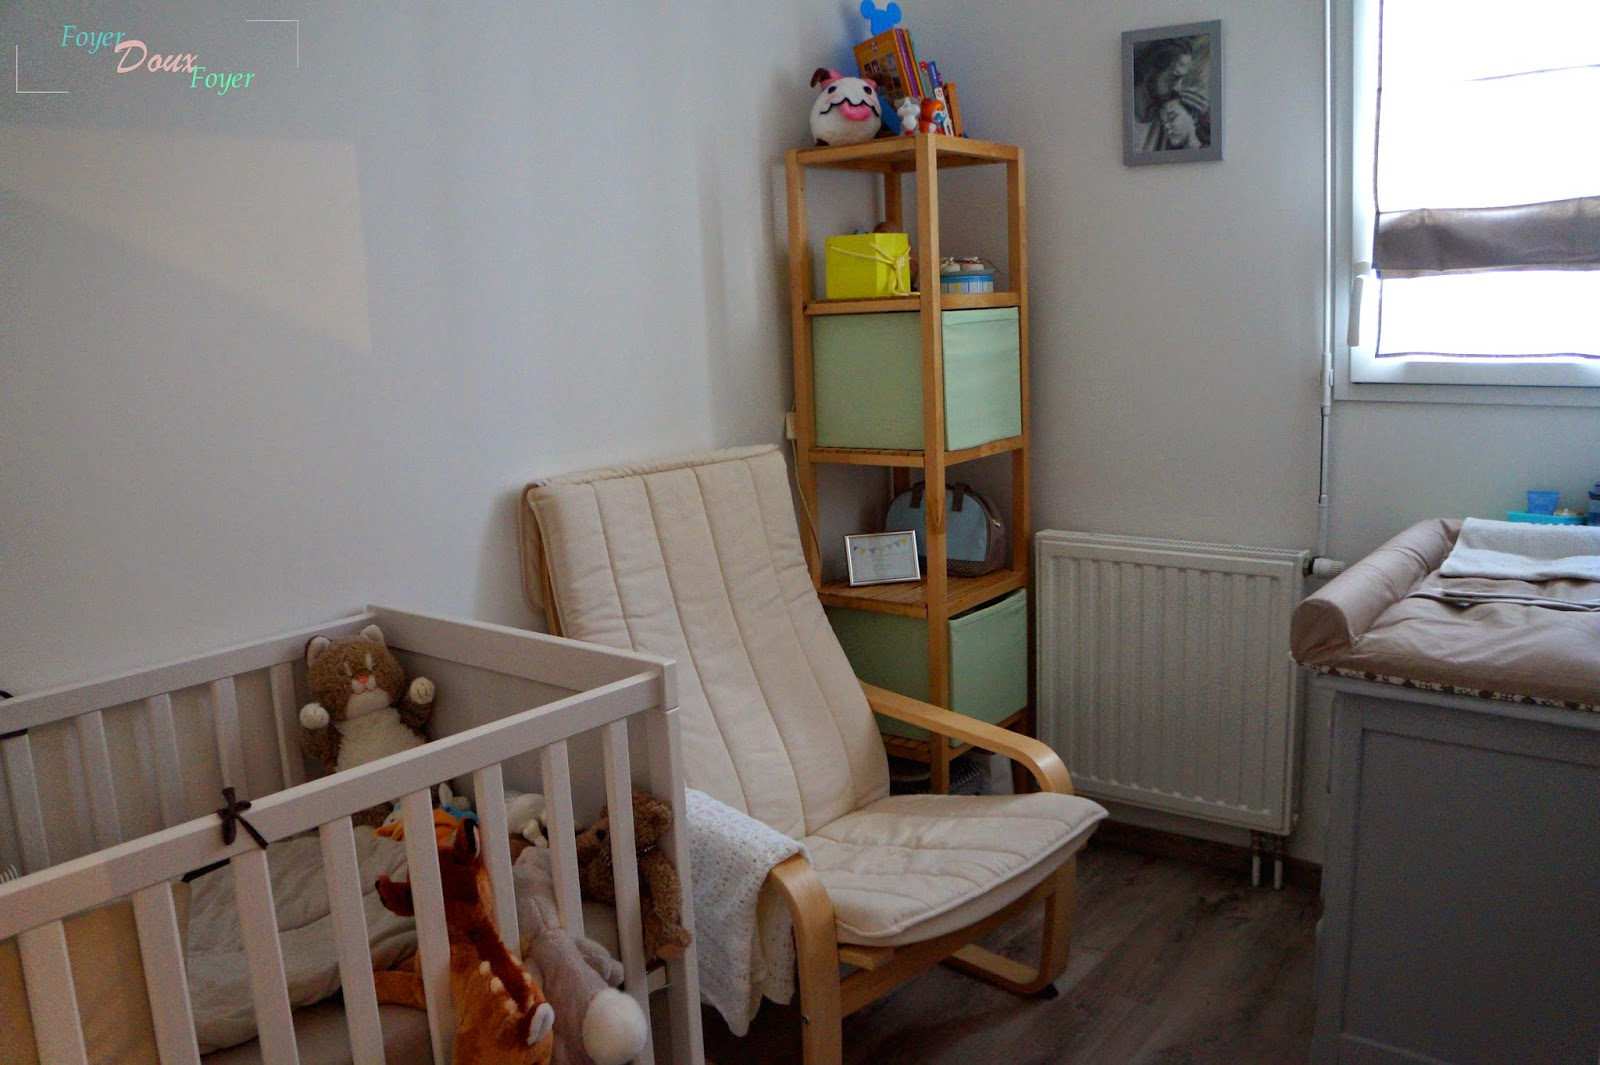 la chambre de b b petit budget foyer doux foyer home